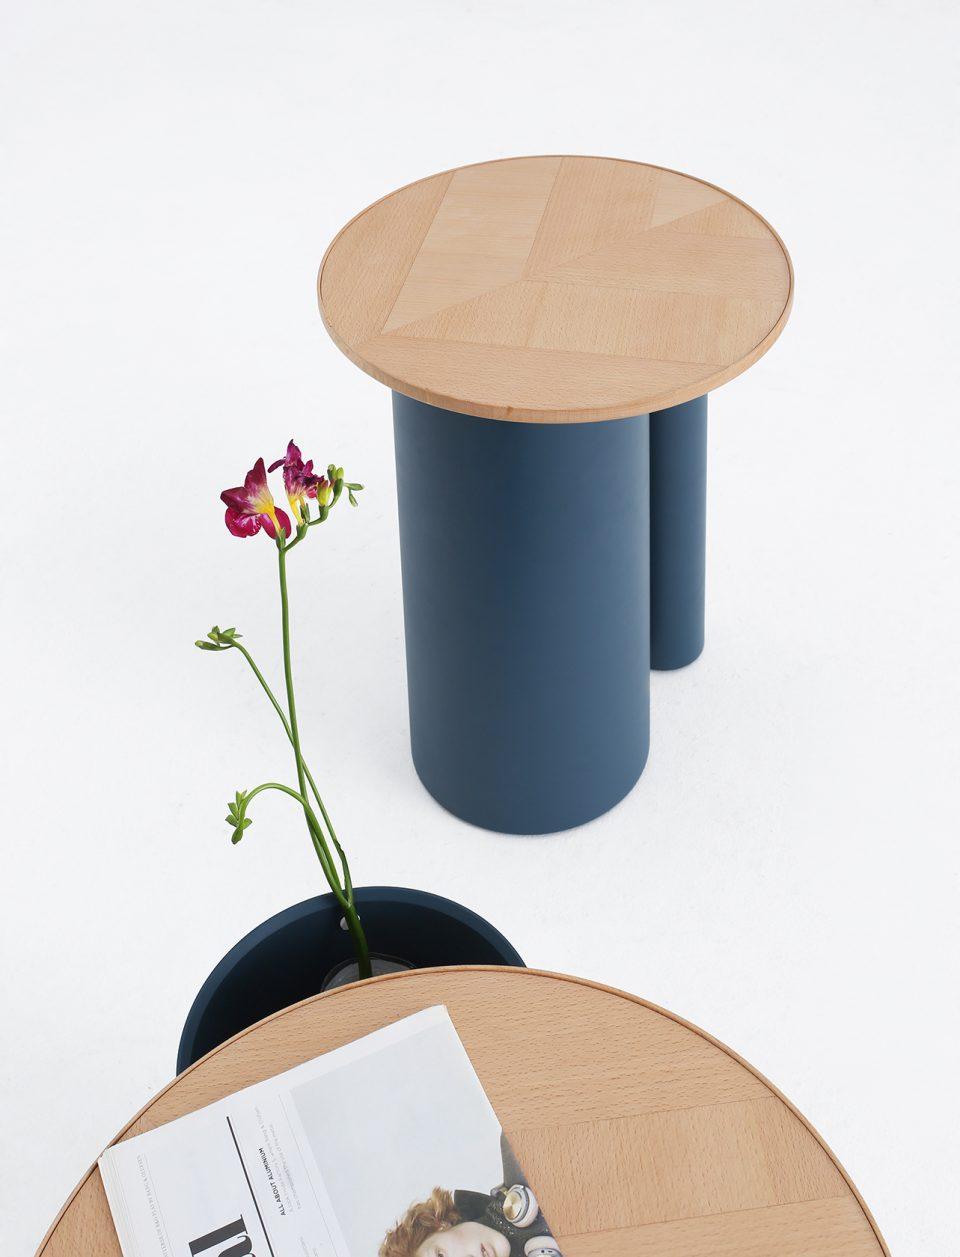 Baldr Side Table - 2019 - Yensuo